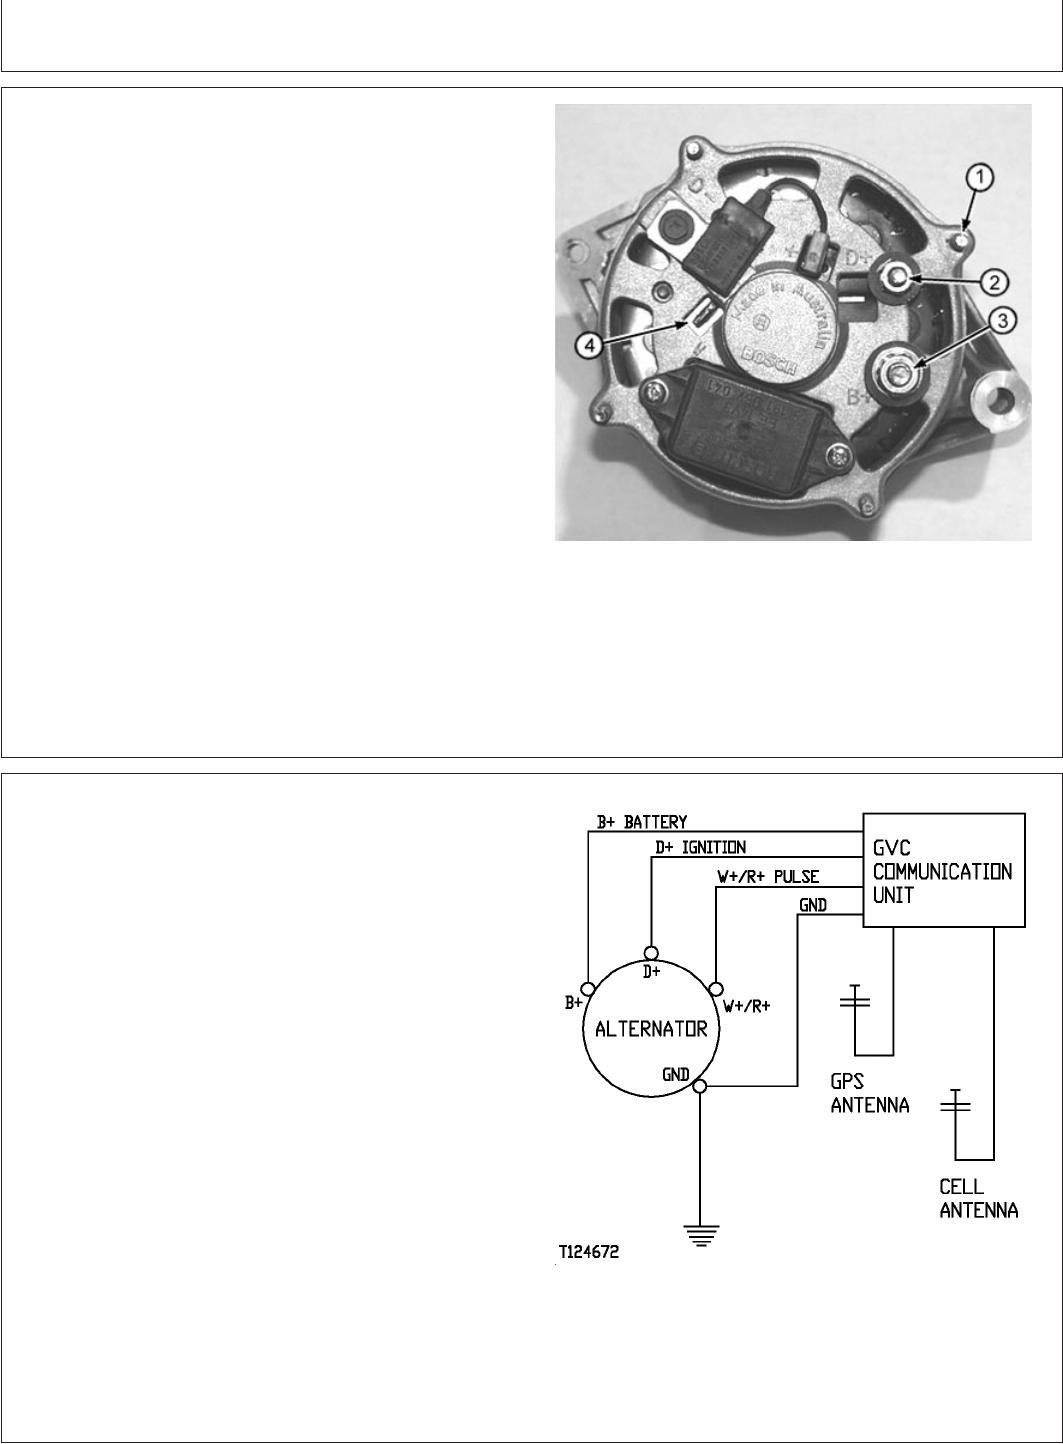 "Deere and John Deere Intelligent Solutions Group VCA10001 ... on john deere tractor wiring, john deere electrical diagrams, john deere 310e backhoe problems, john deere rear end diagrams, john deere sabre mower belt diagram, john deere riding mower diagram, john deere starters diagrams, john deere gt235 diagram, john deere 42"" deck diagrams, john deere fuel gauge wiring, john deere 3020 diagram, john deere repair diagrams, john deere power beyond diagram, john deere cylinder head, john deere 212 diagram, john deere fuse box diagram, john deere 345 diagram, john deere fuel system diagram, john deere voltage regulator wiring, john deere chassis,"